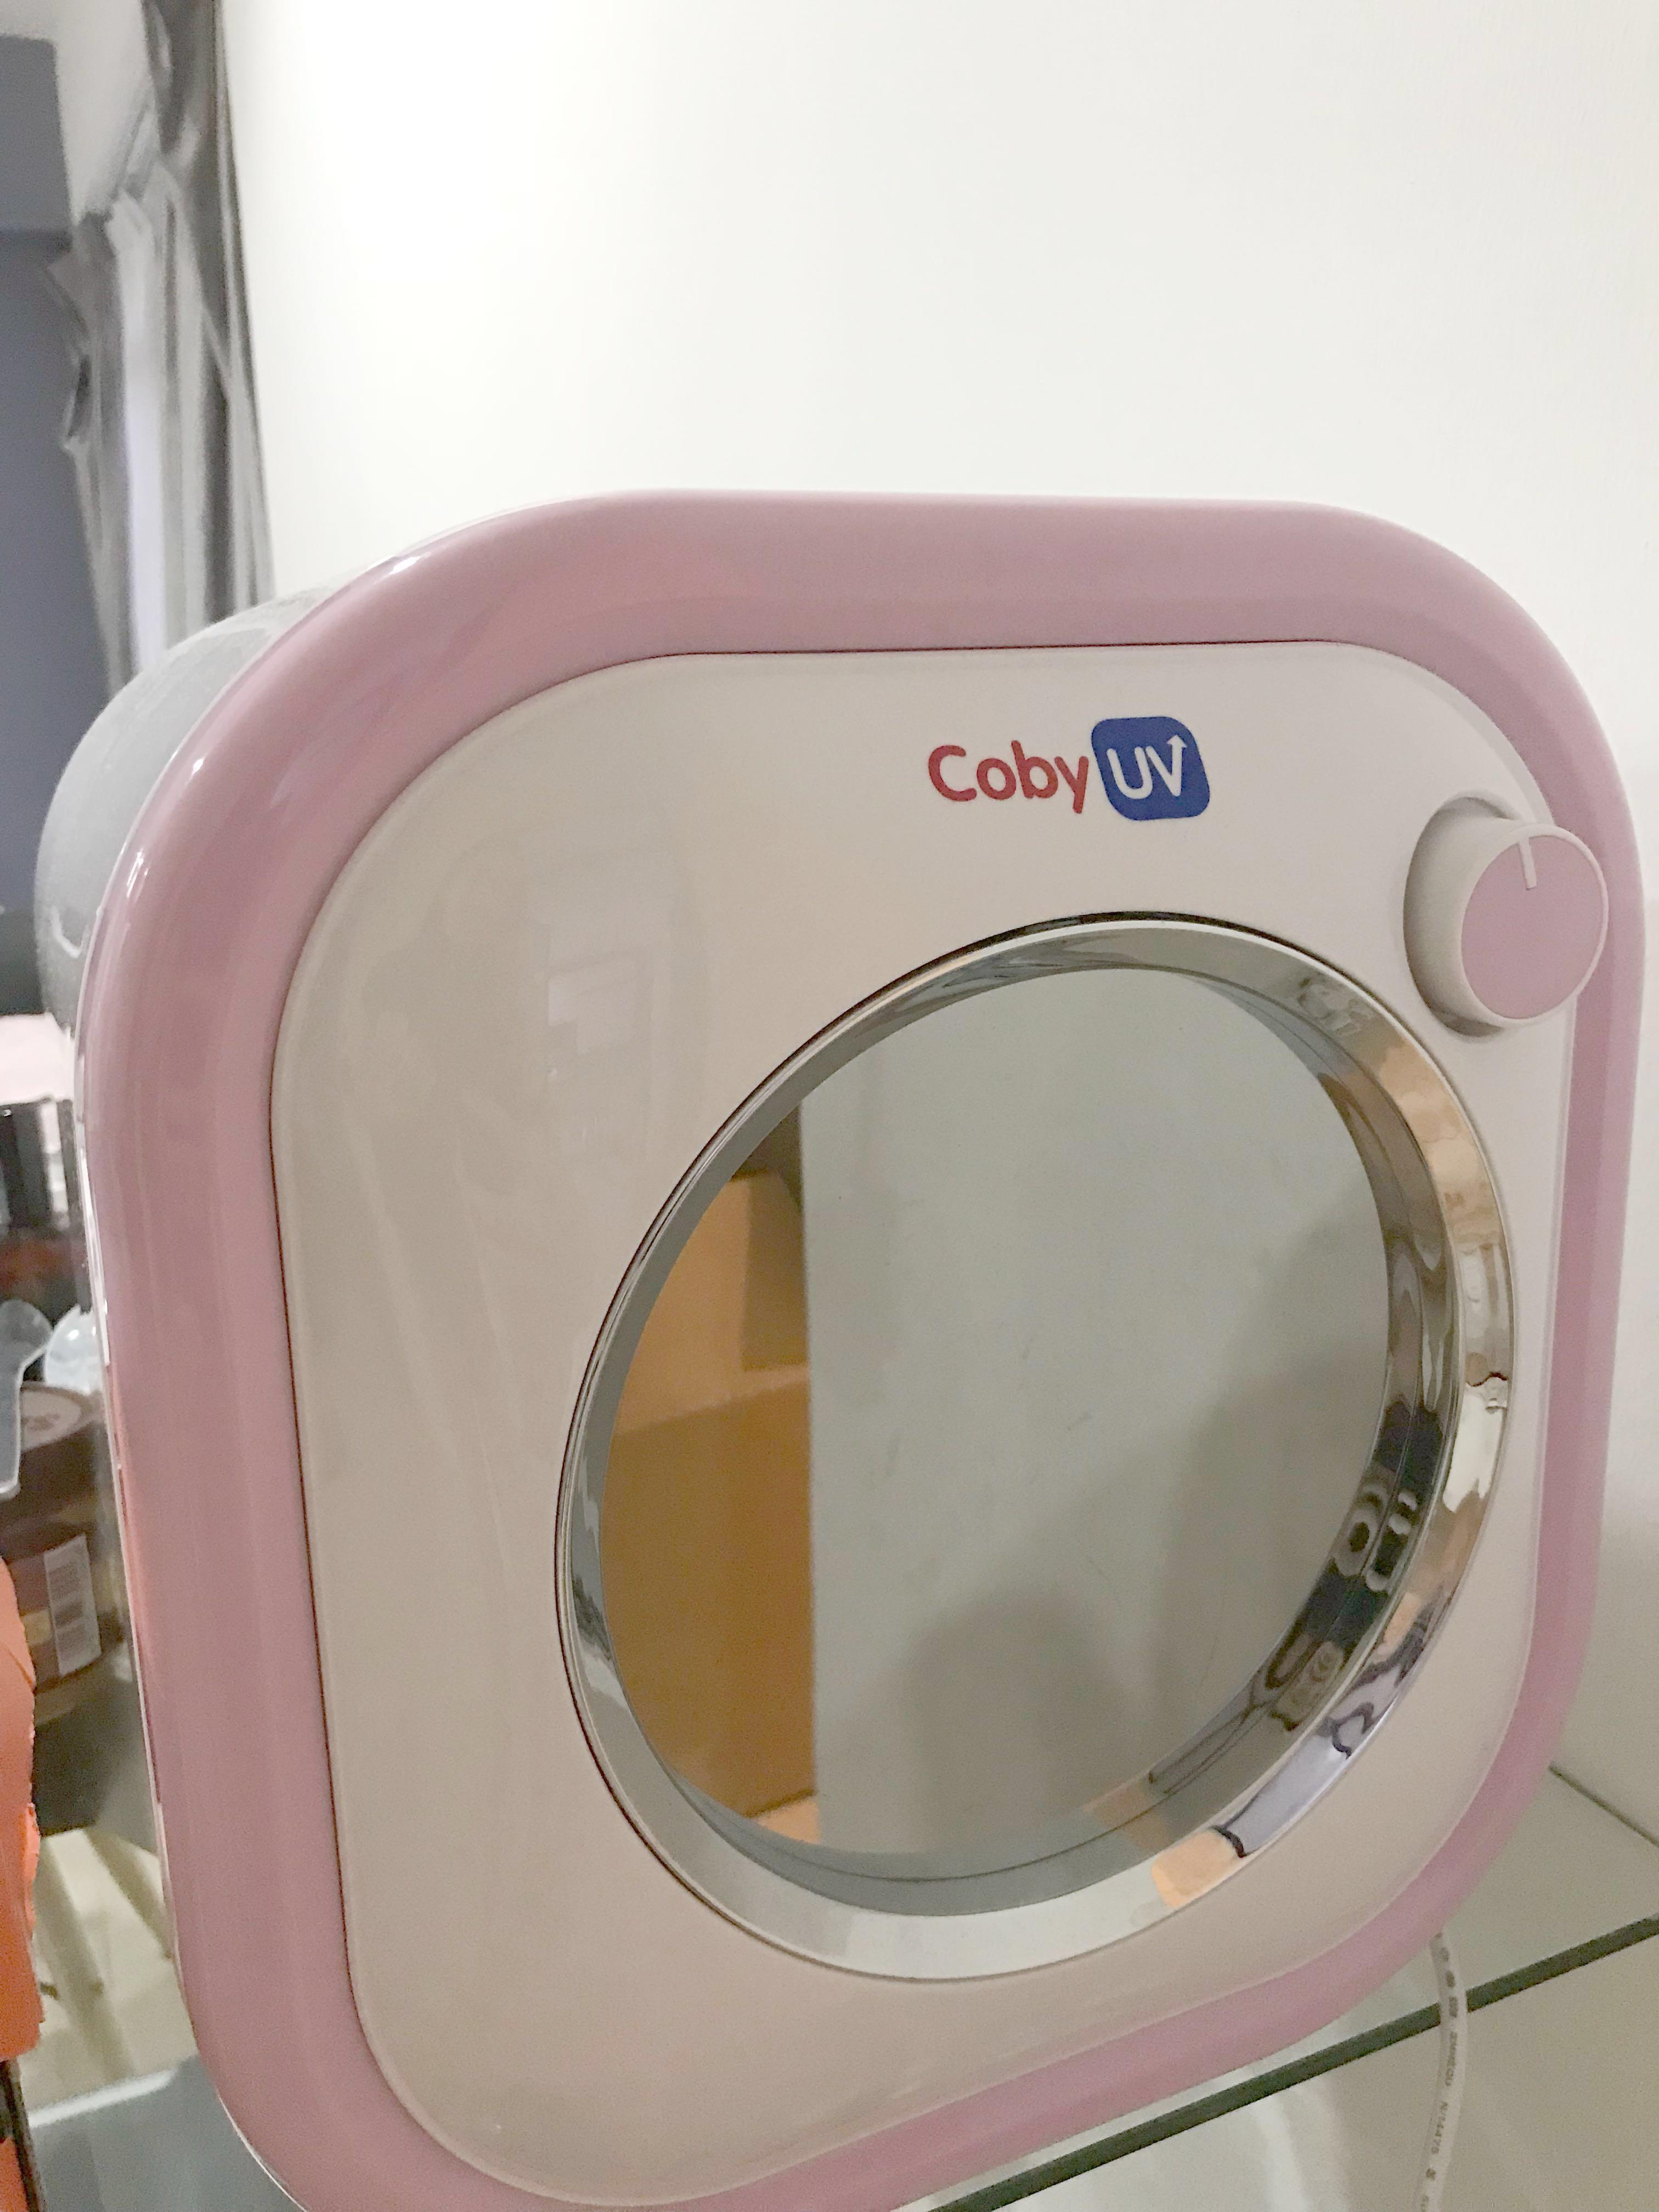 COBY UV steriliser - pick up by 4th April